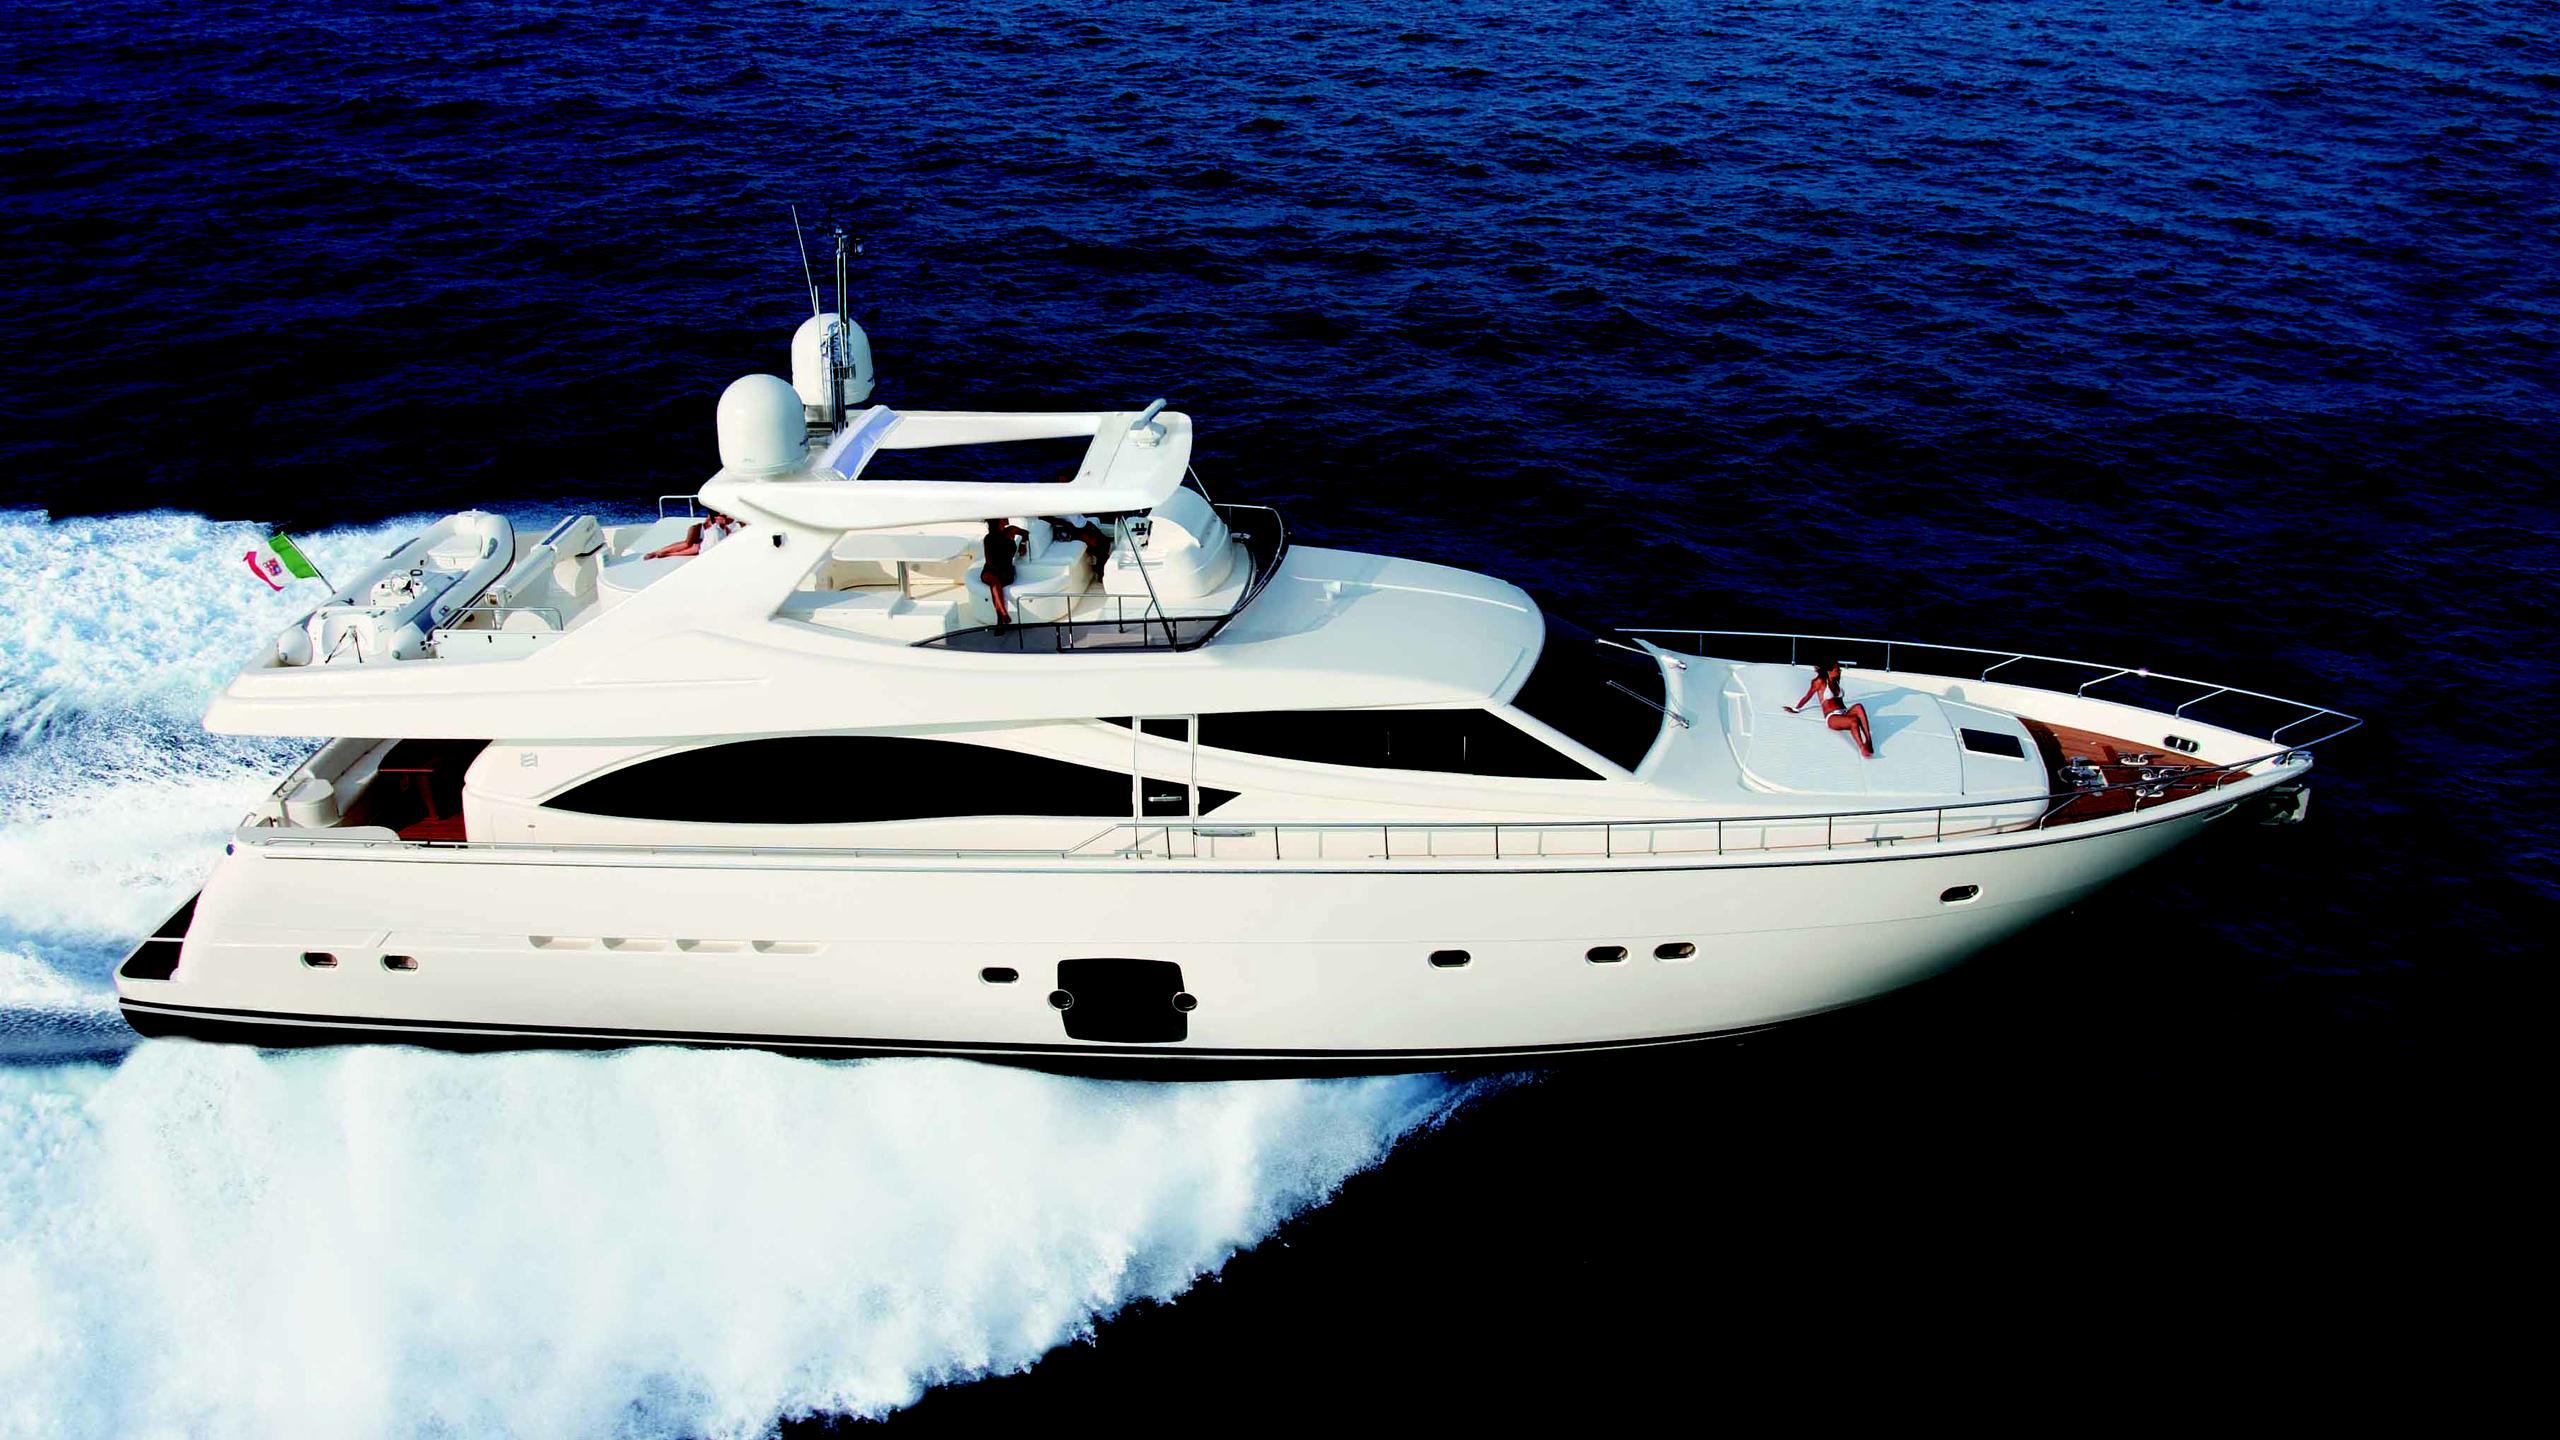 unforgettable-motor-yacht-ferretti-830-2006-25m-cruising